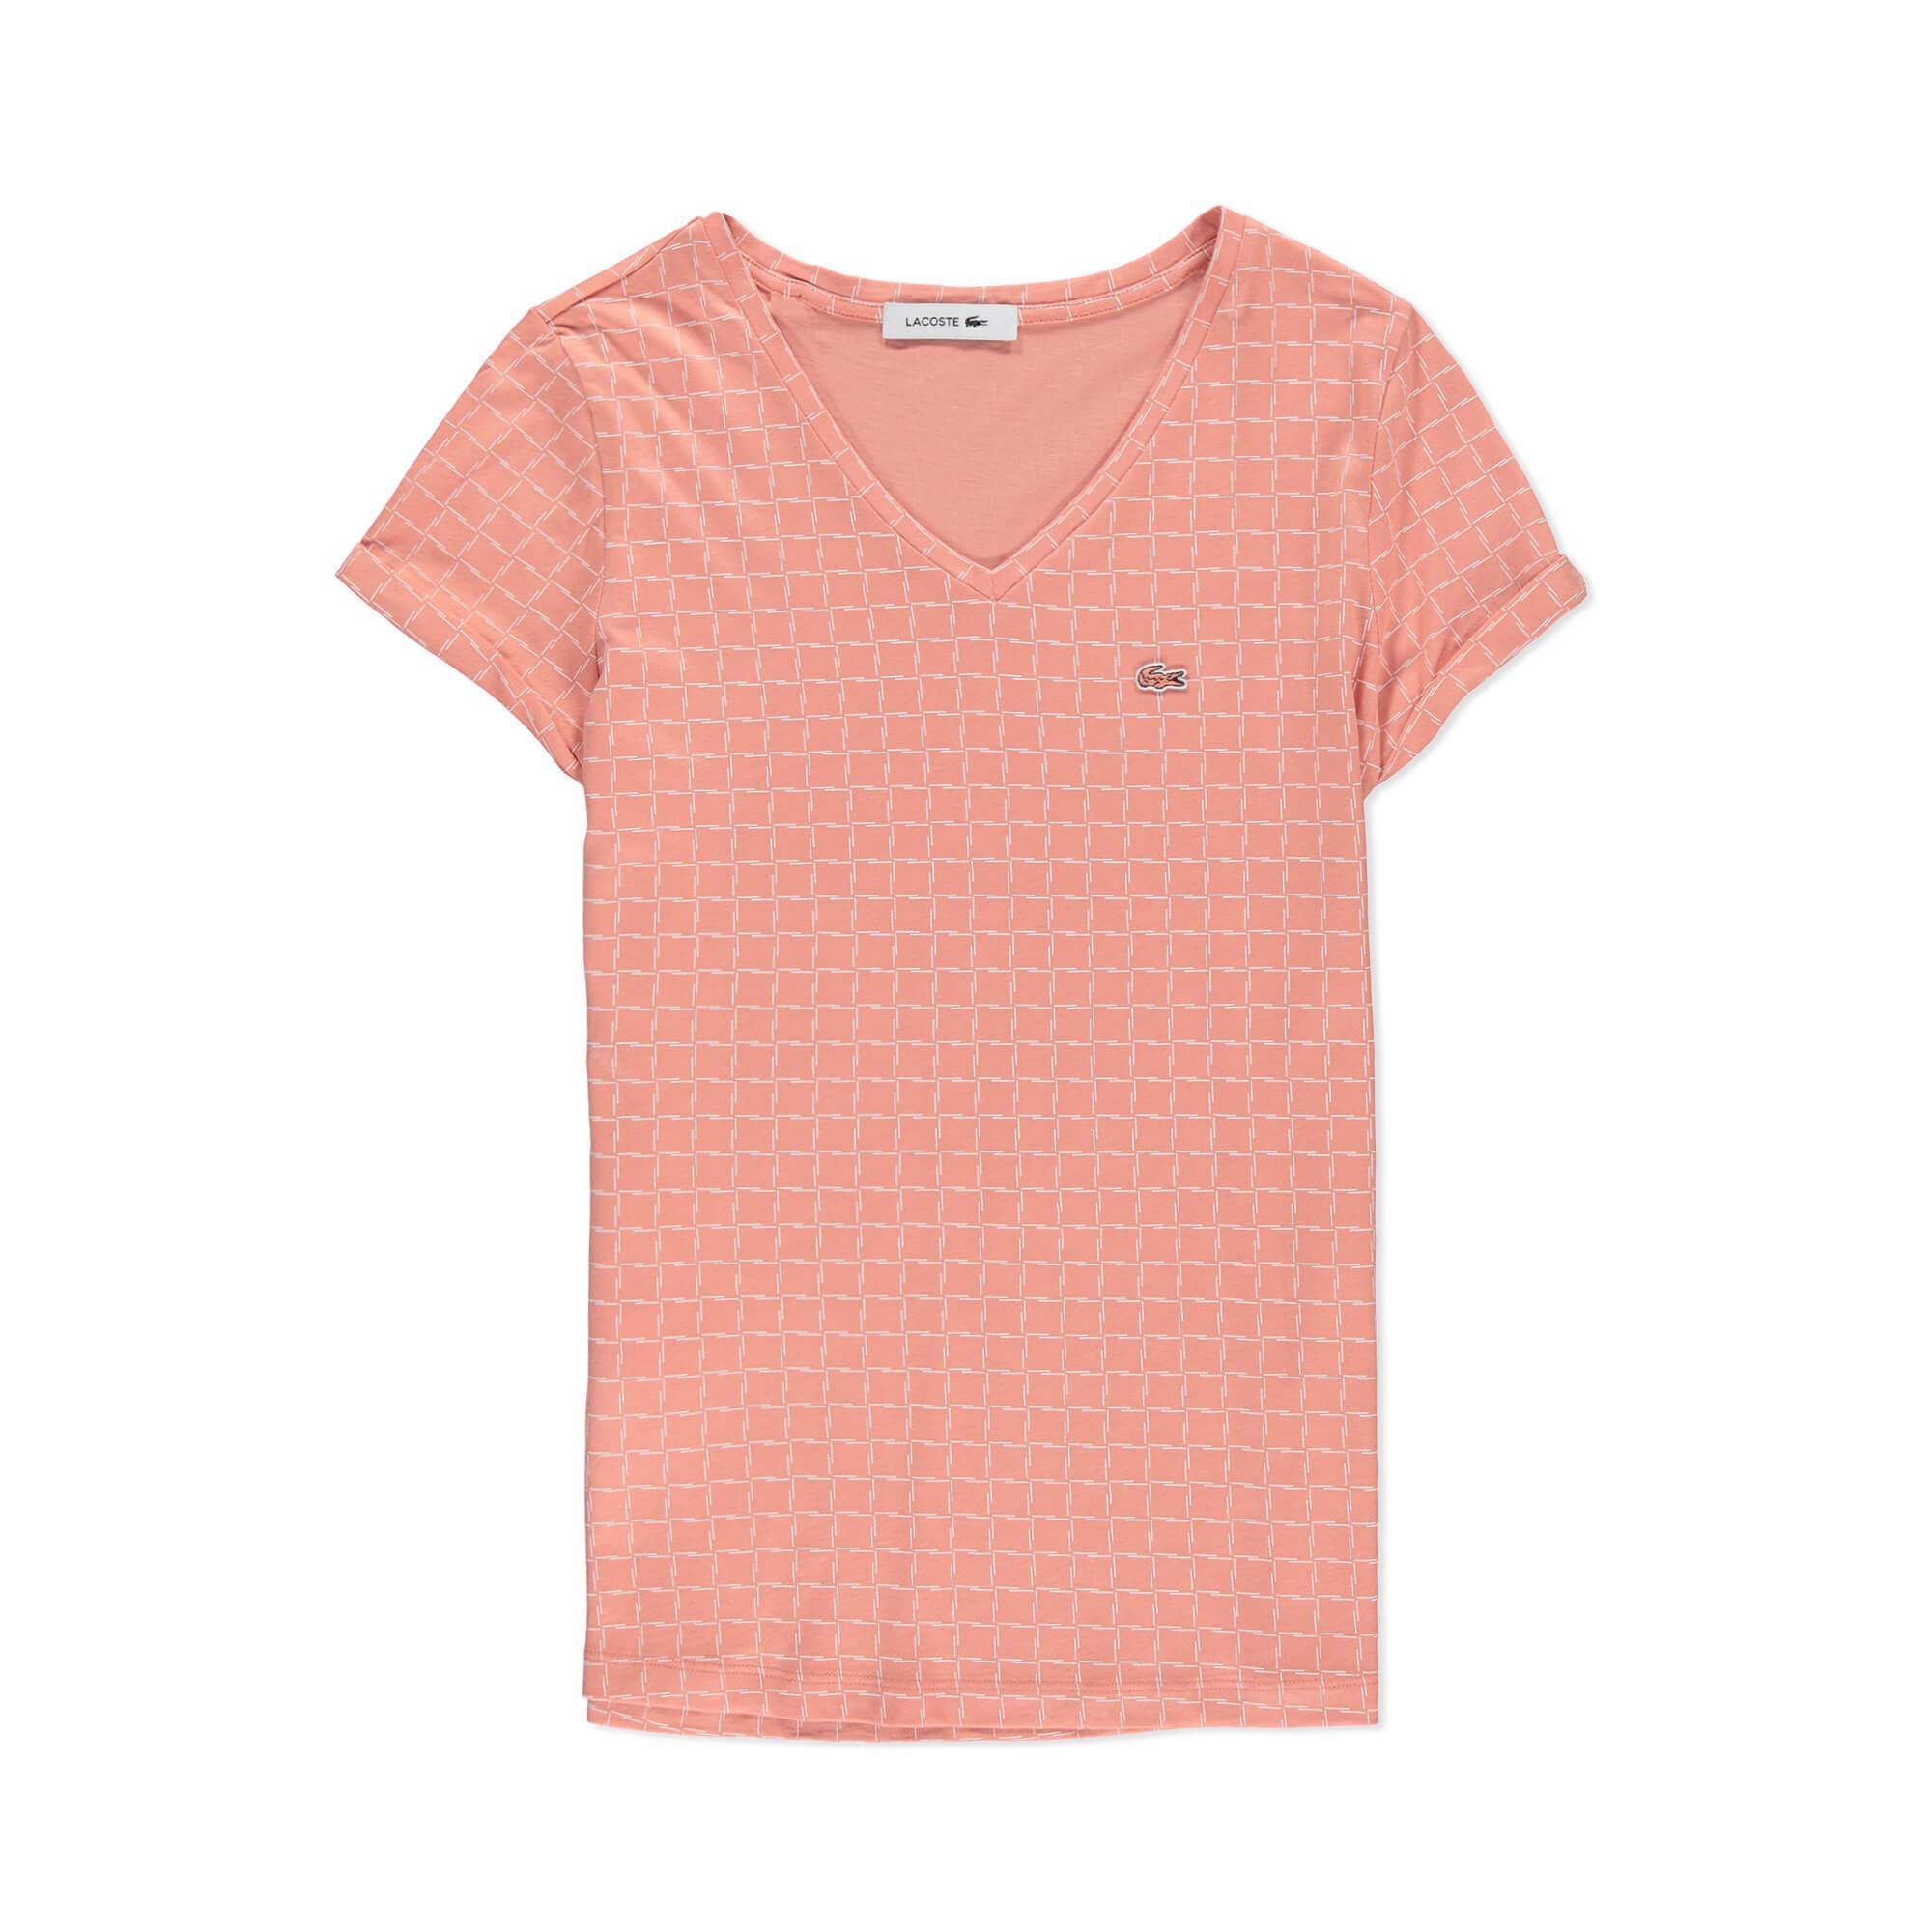 Lacoste Kadın Pembe V Yaka T-Shirt